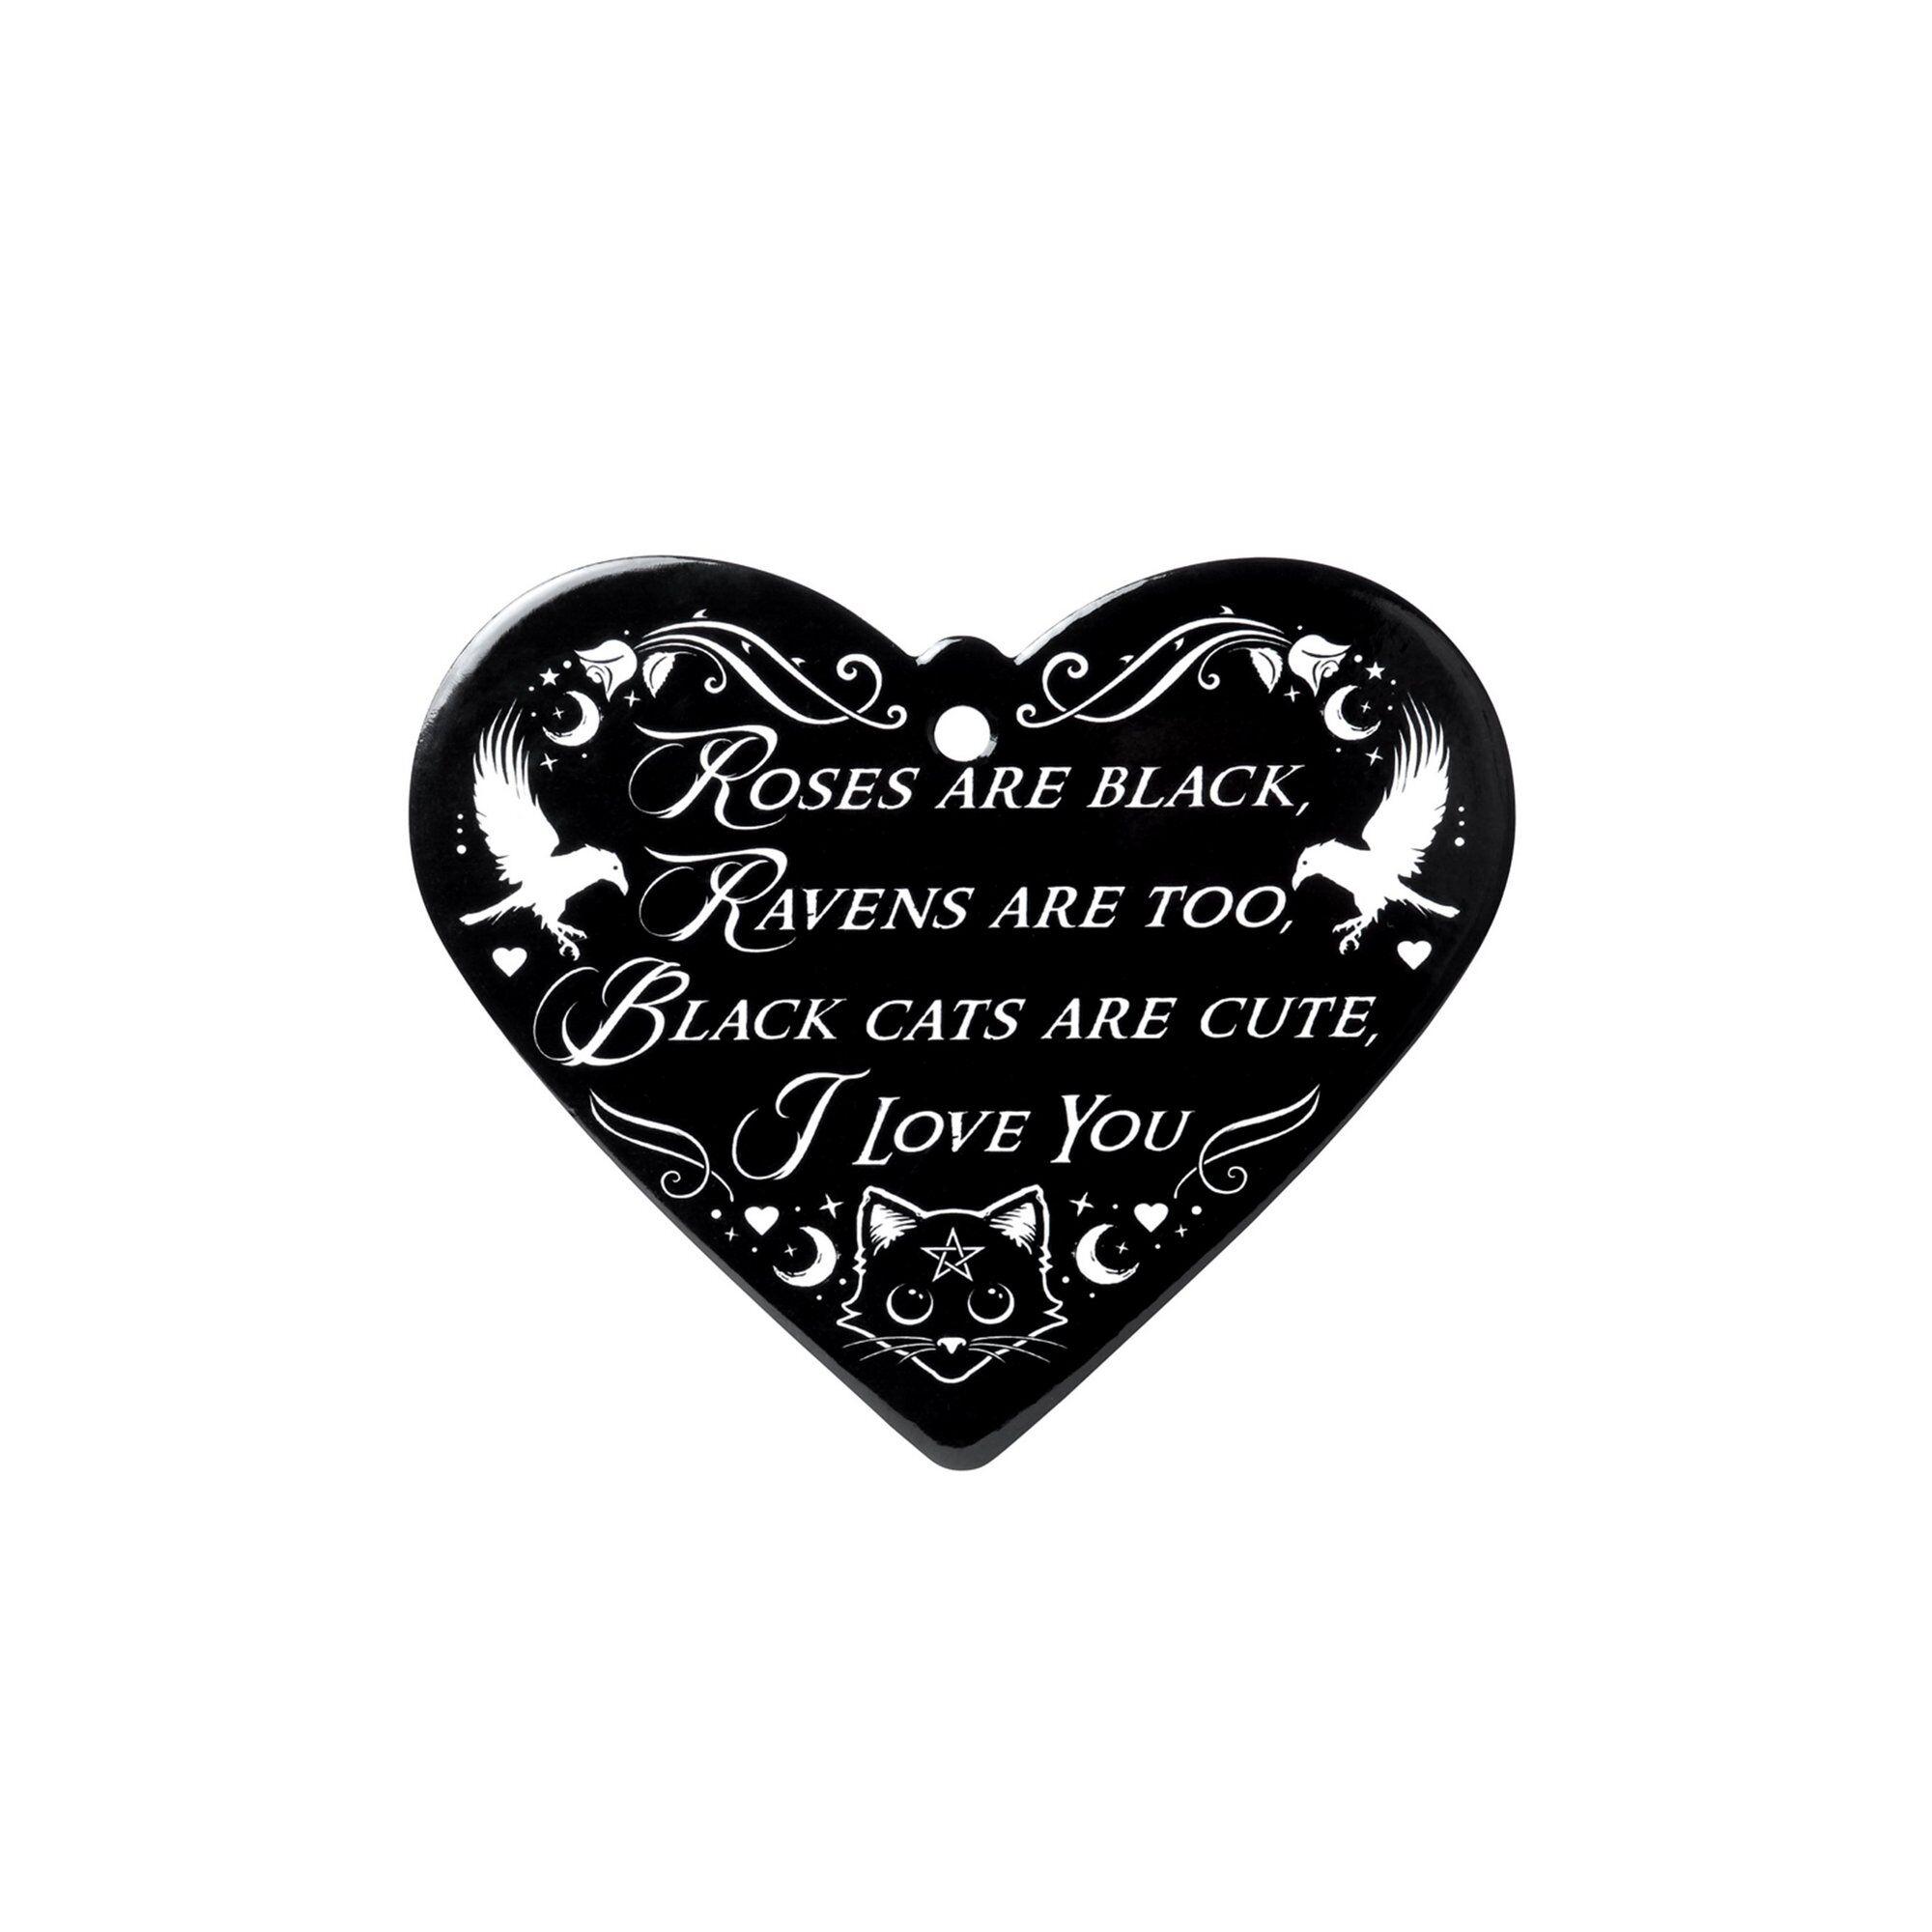 Studio Roses Are Black - Poetic Heart Coaster  - Multi